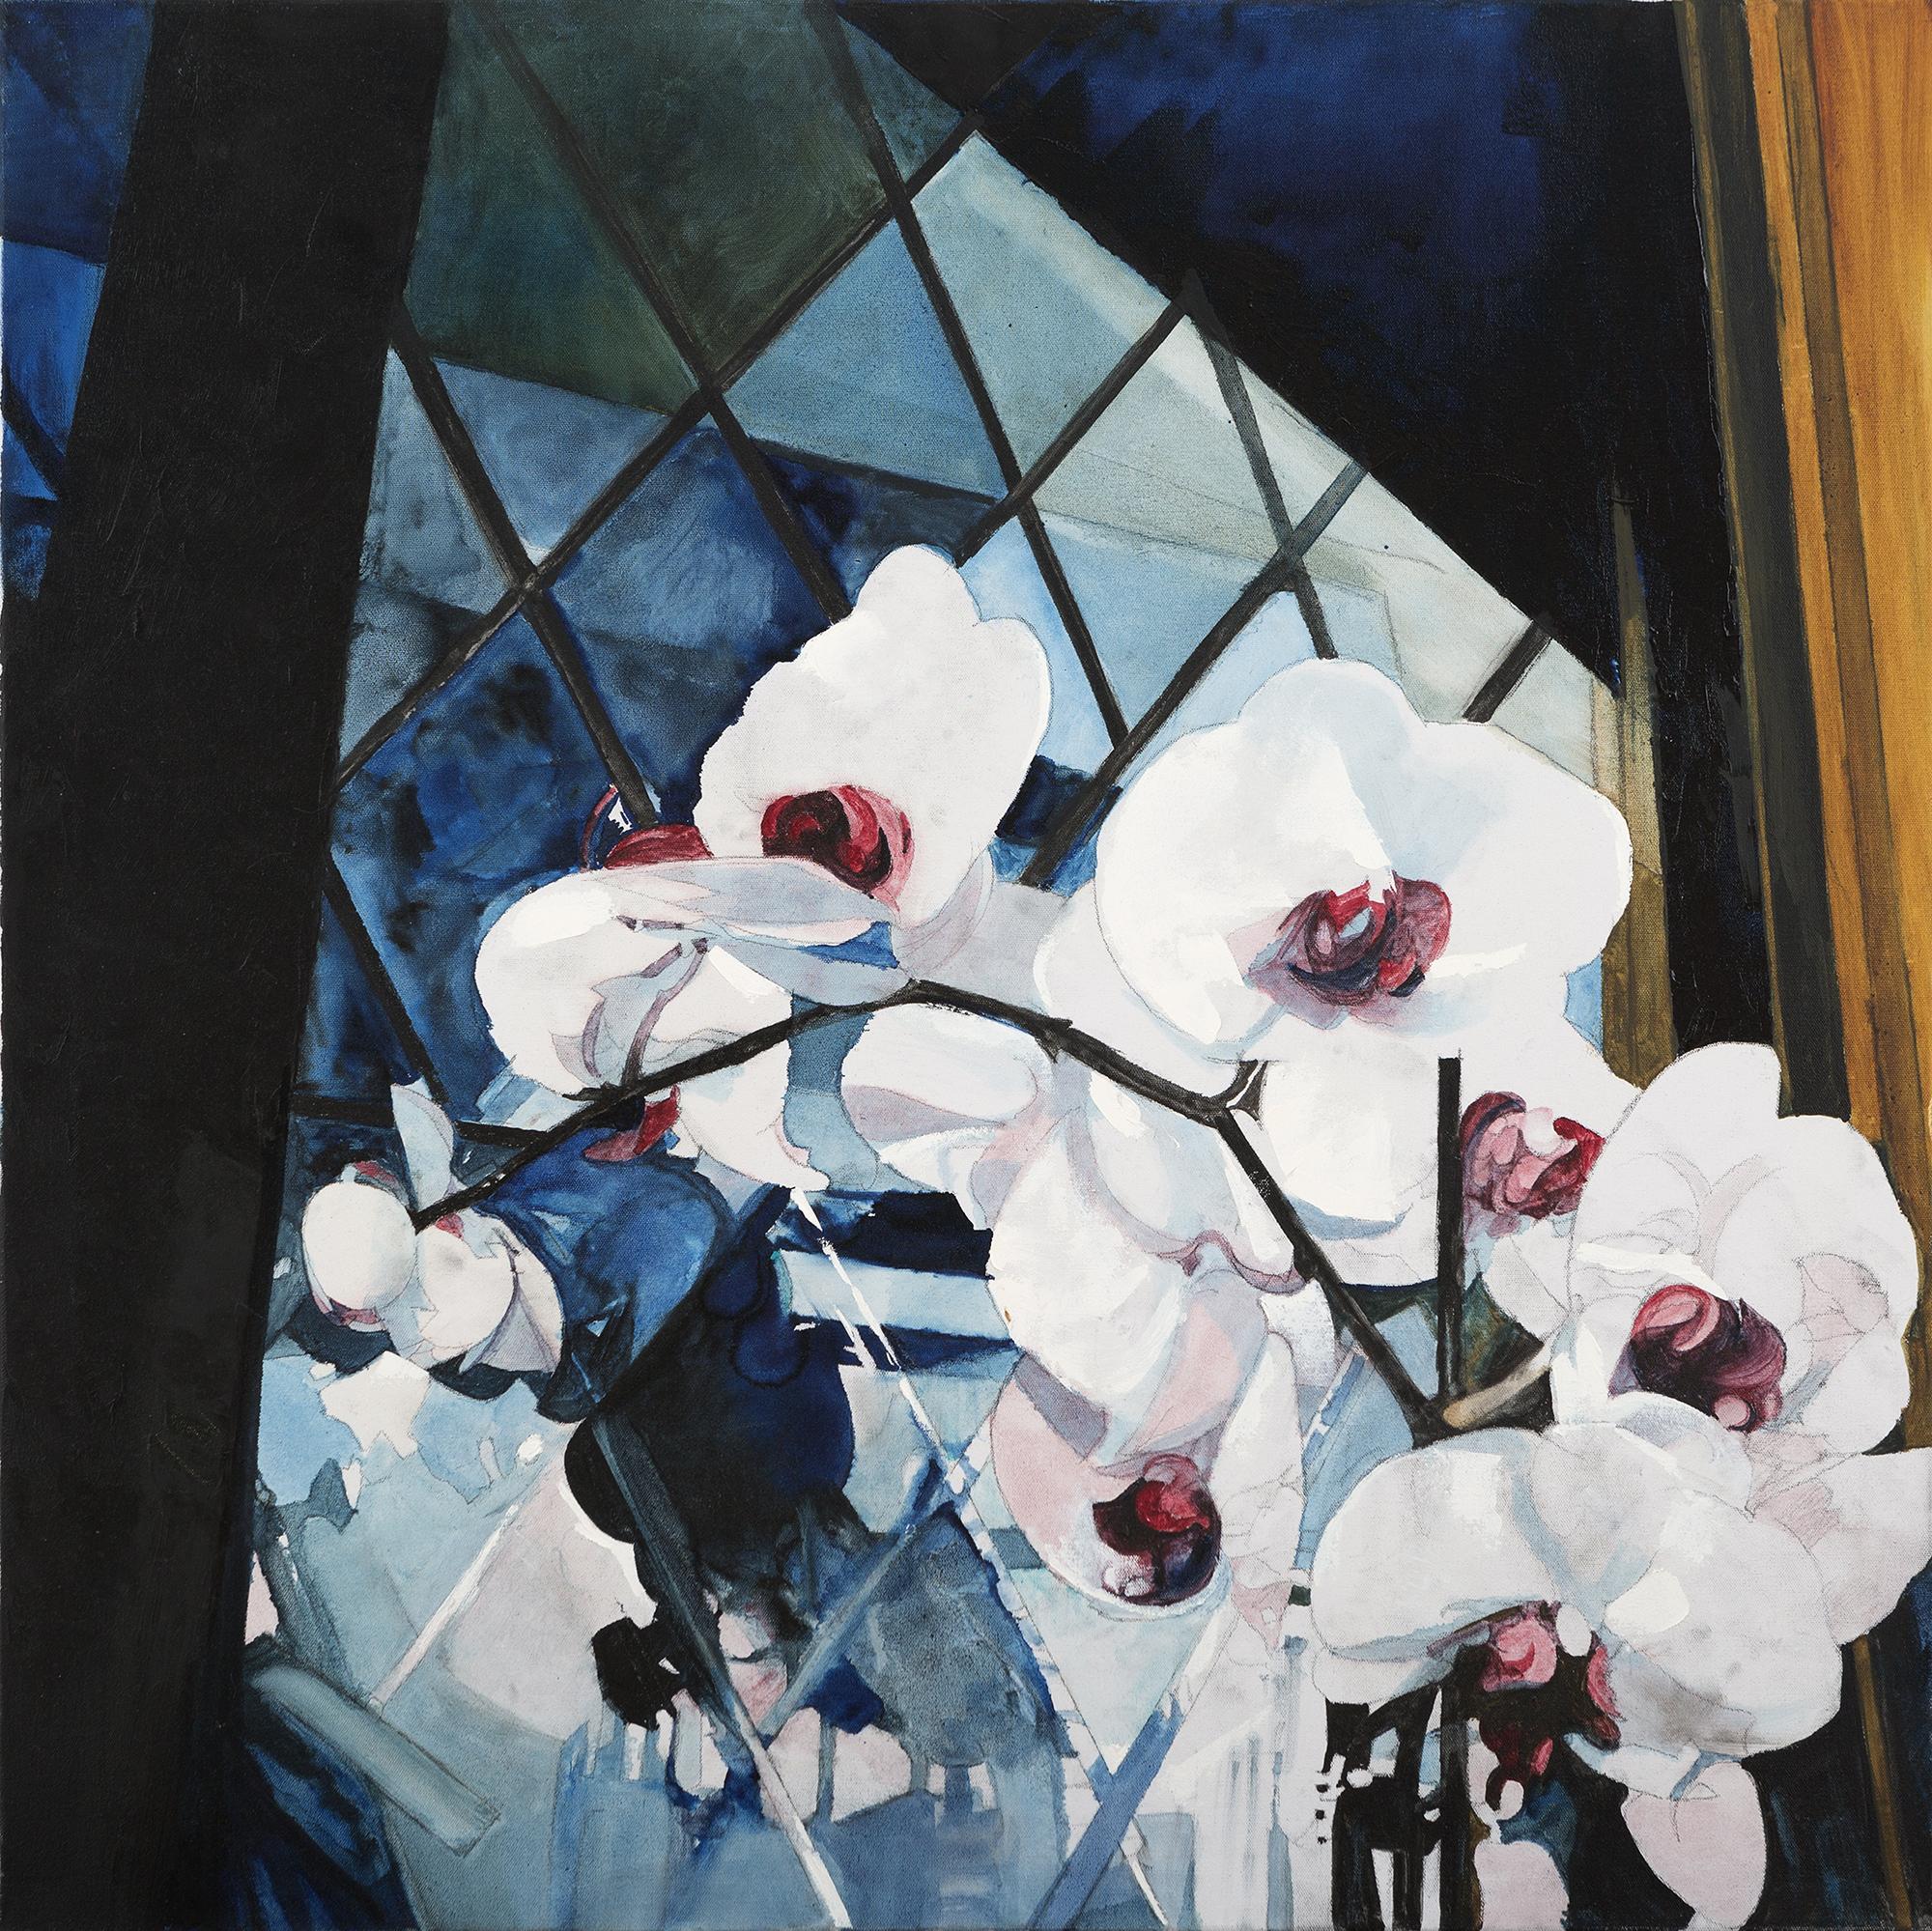 ©Clerestory-Fine-Art-4_orchids_ILB3426-STYMEST-EDIT-36X36.jpg